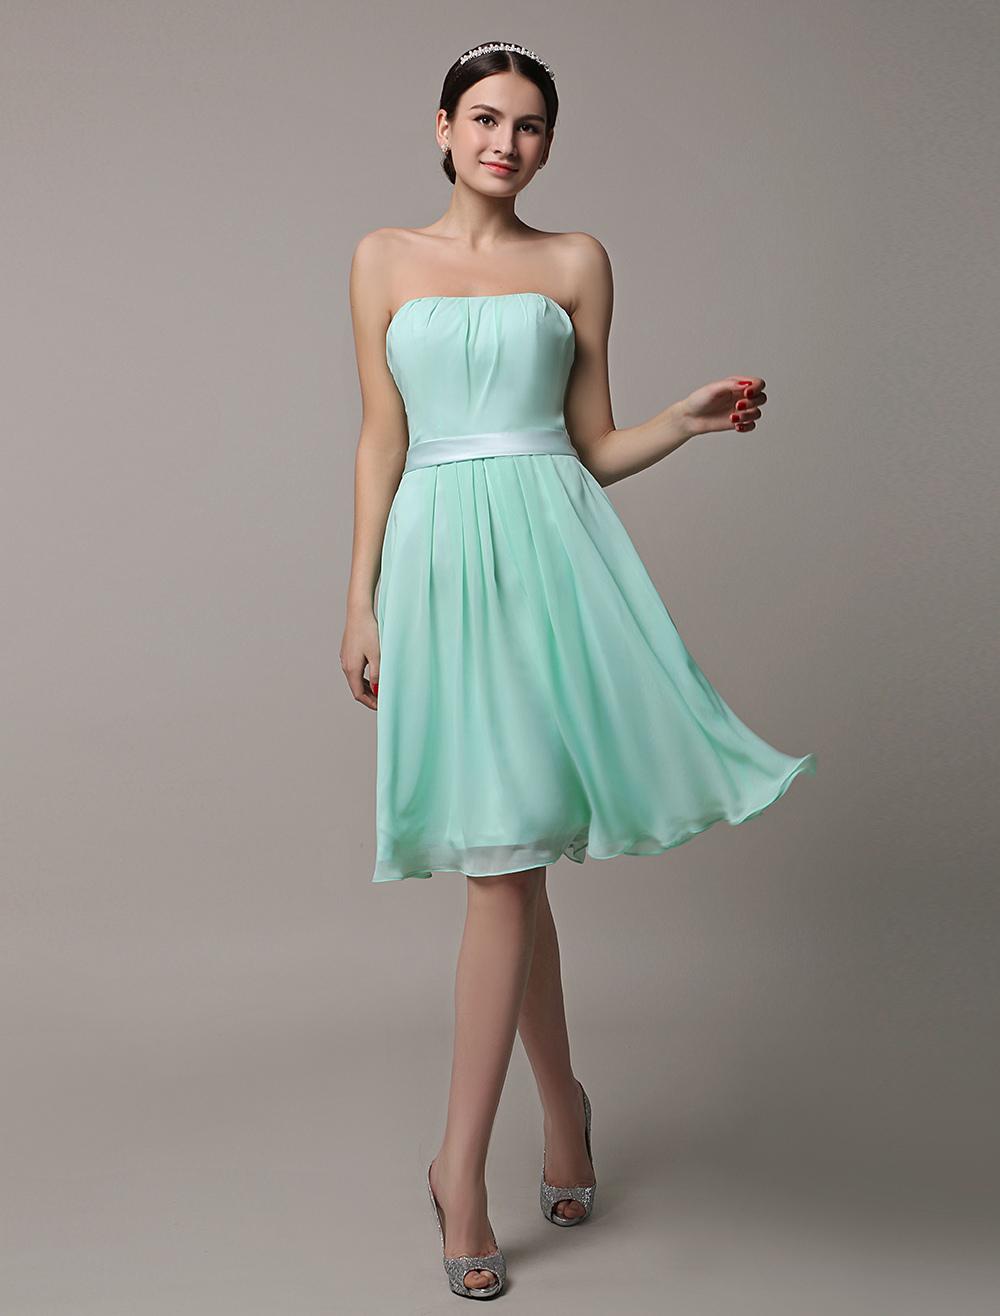 2017 Short Mint Green Strapless Bridesmaid Dress With Sash